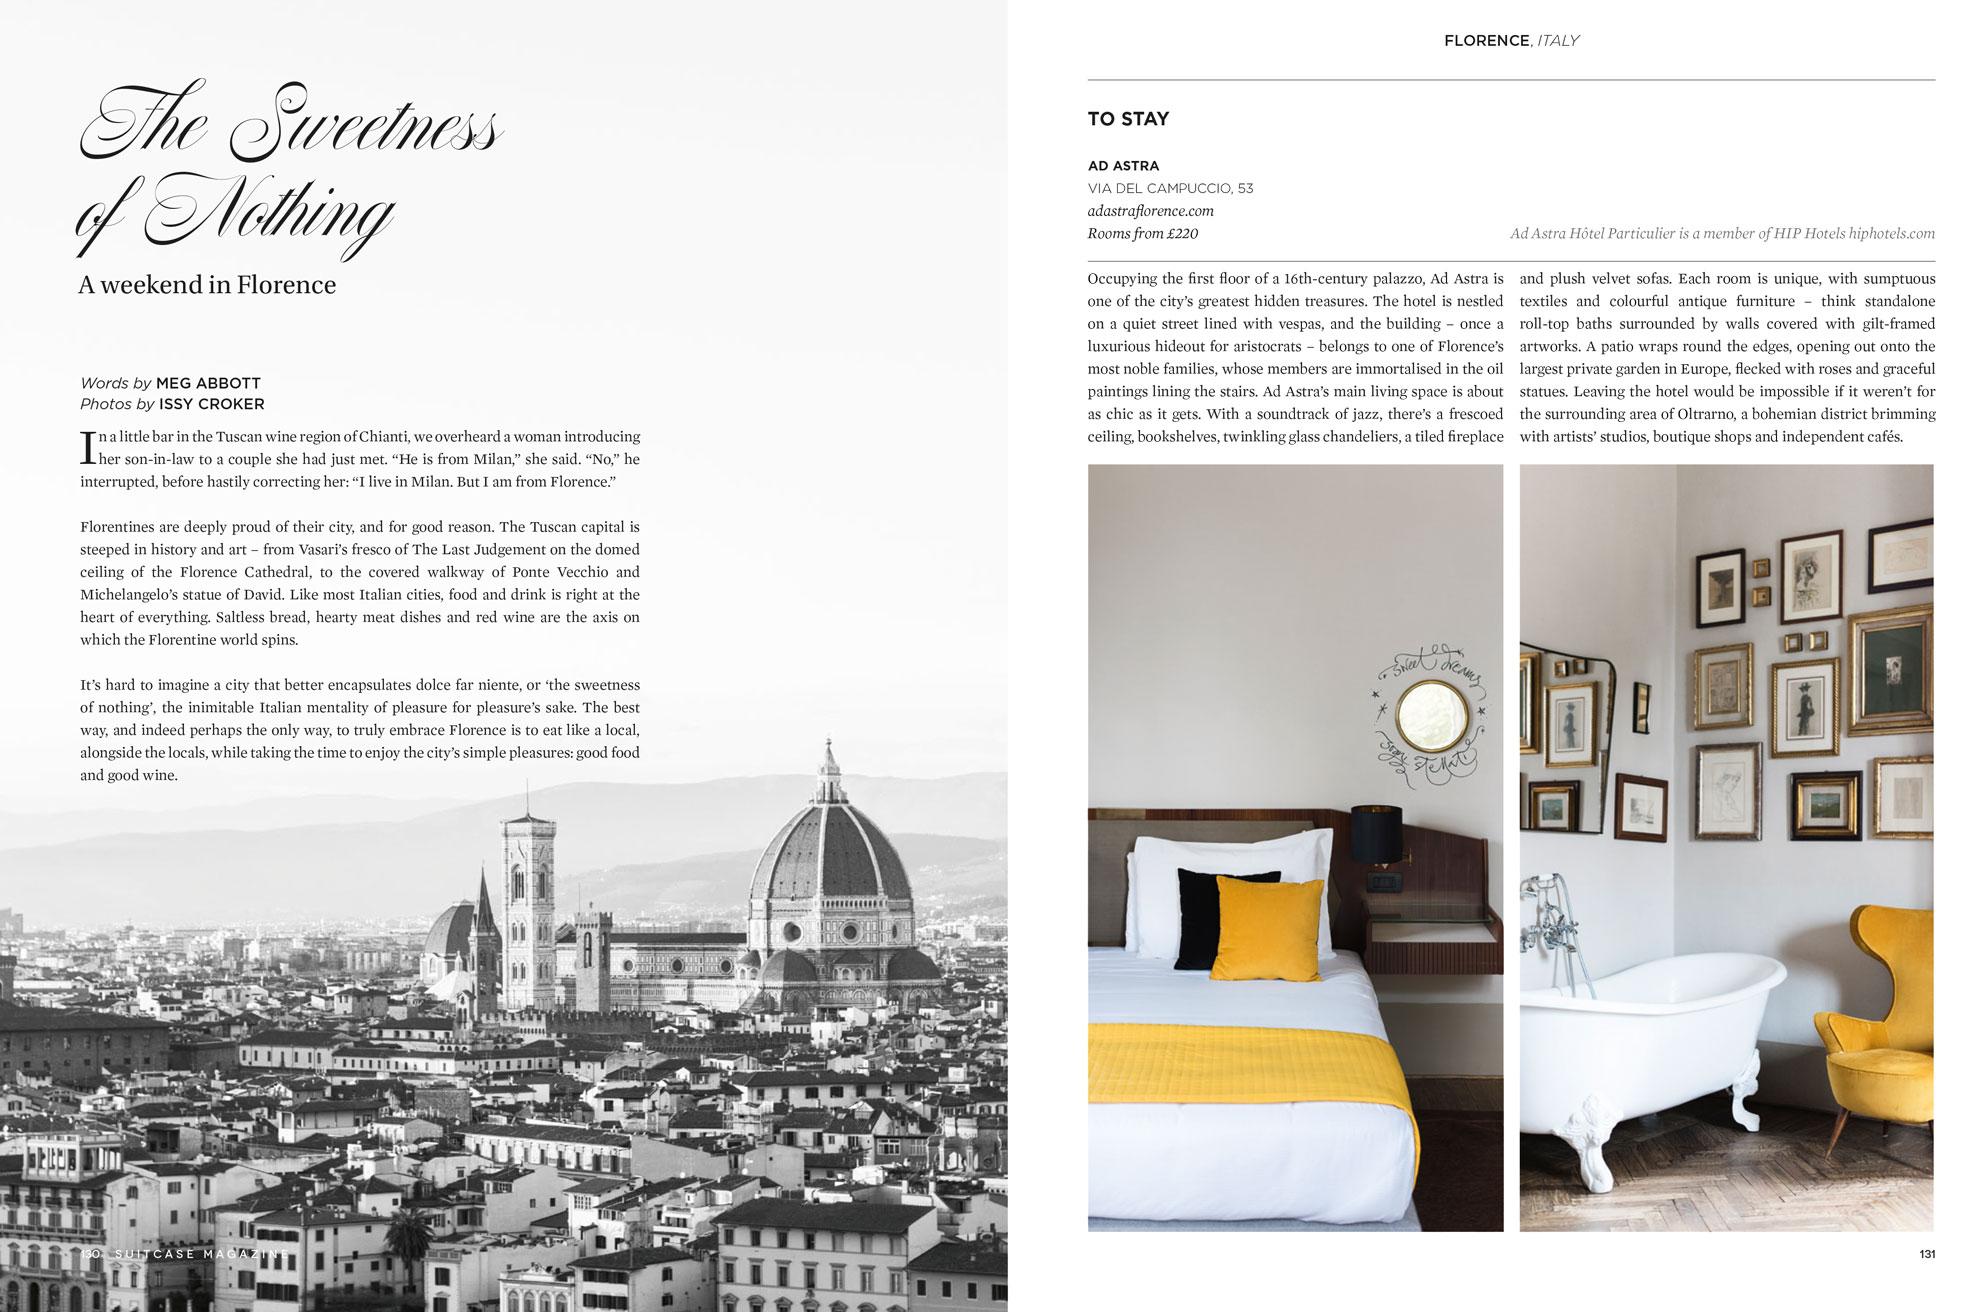 Florence-guide-1.jpg